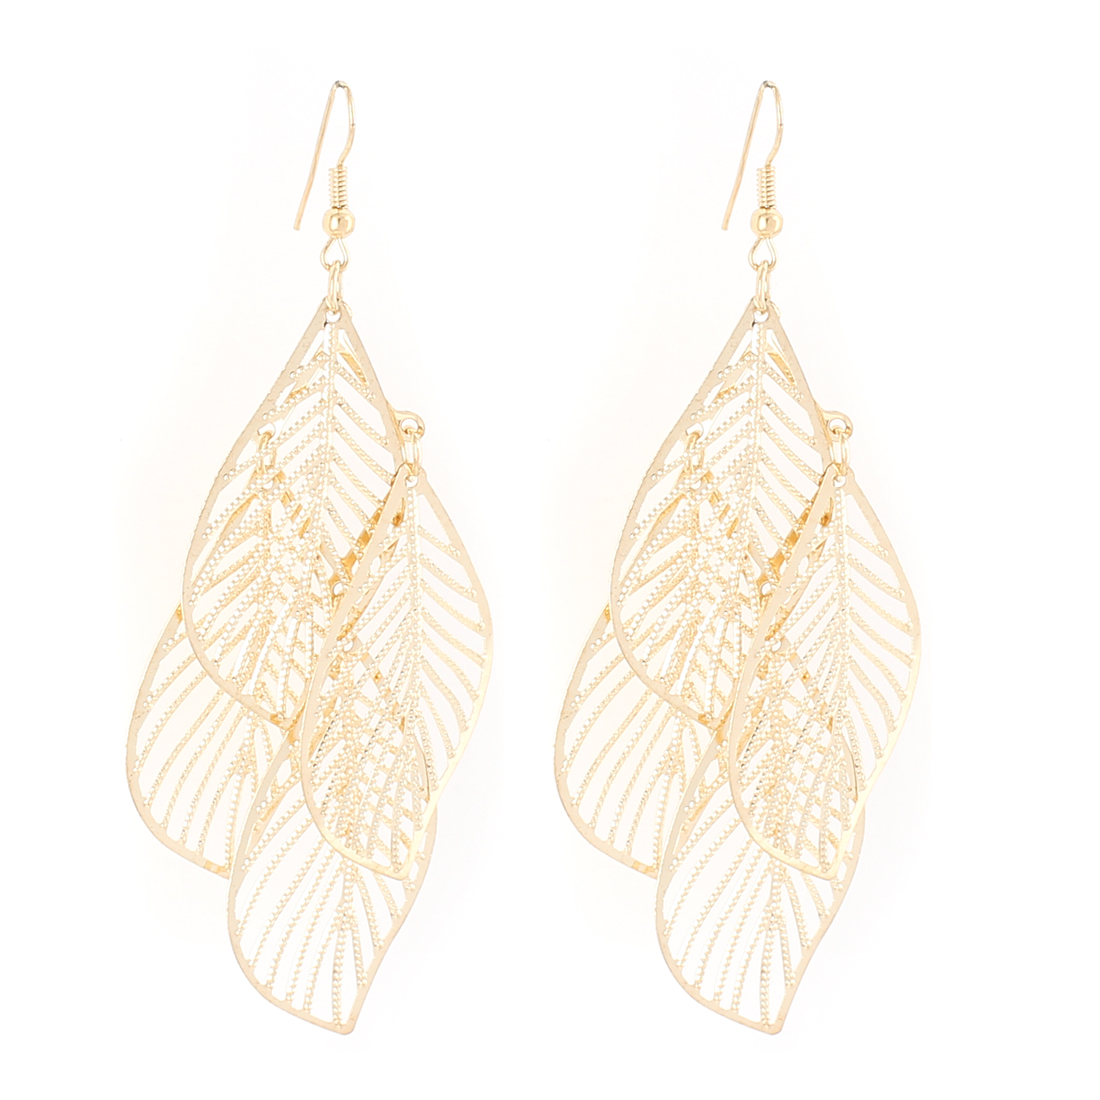 Lady Hollow Leaf Shape Dangle Chandelier Fish Hook Earrings Gold Tone Pair